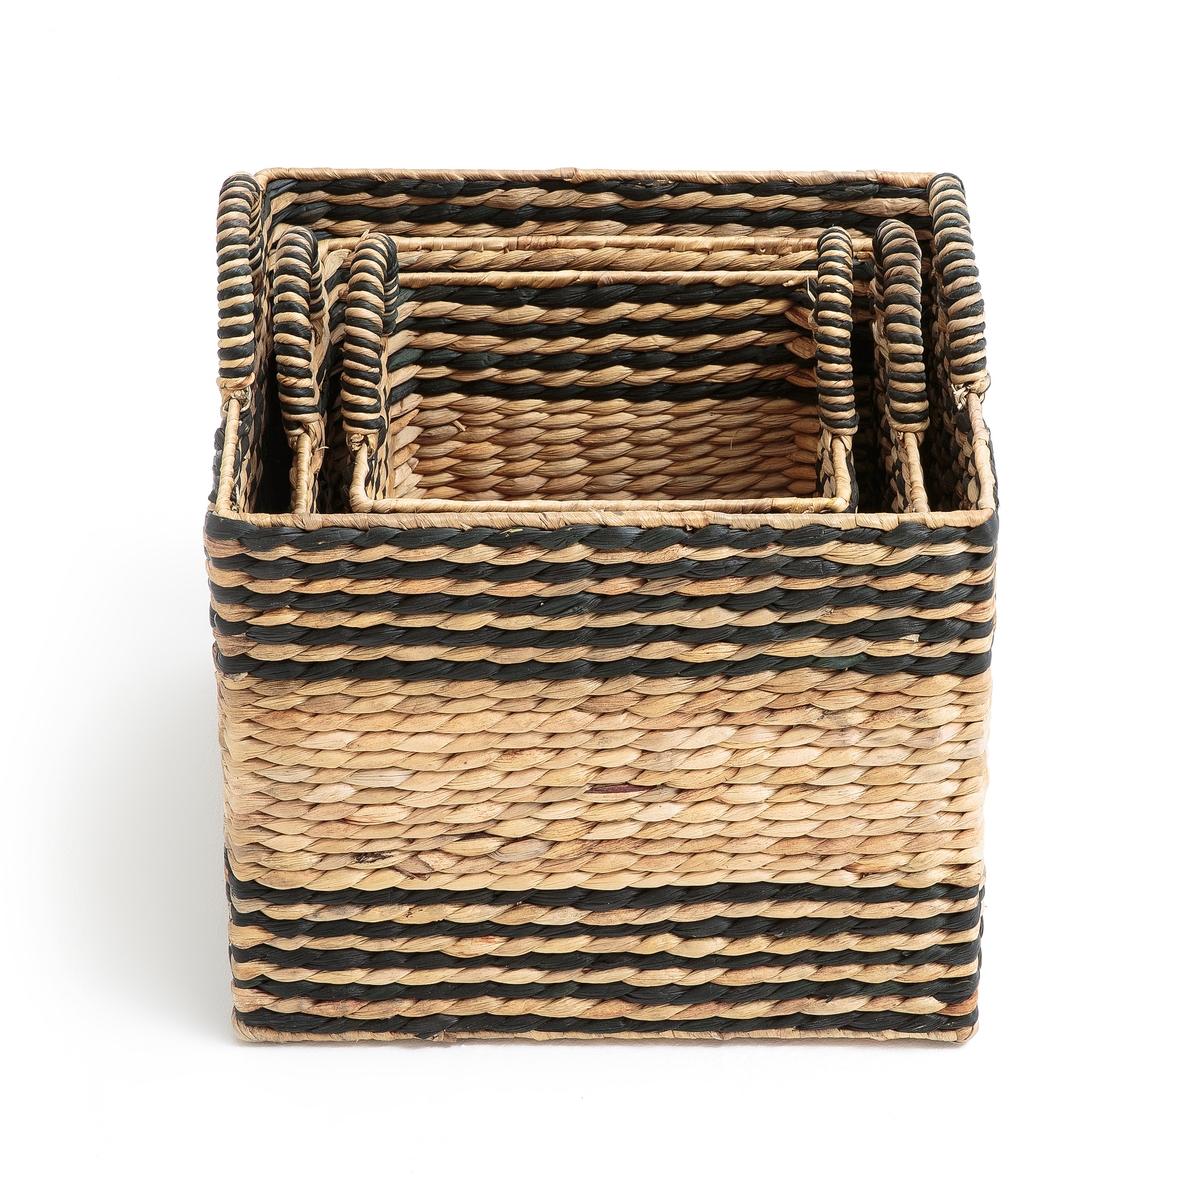 3 корзины плетеные